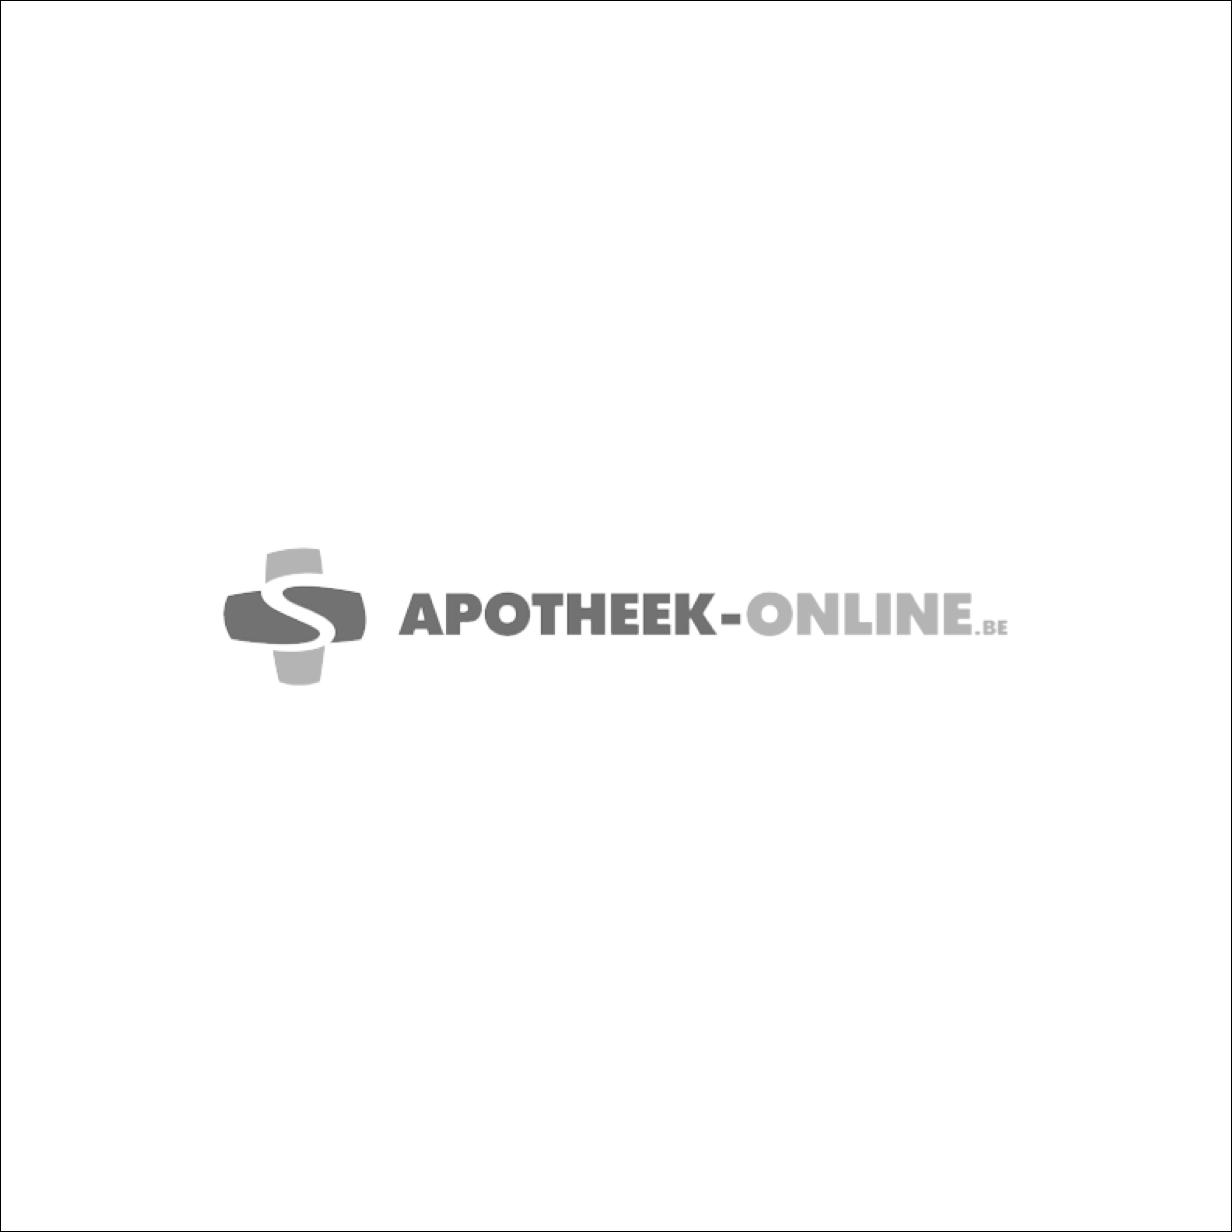 GAZIN CP N/STER 12P 10,0X10,0CM 100 18507